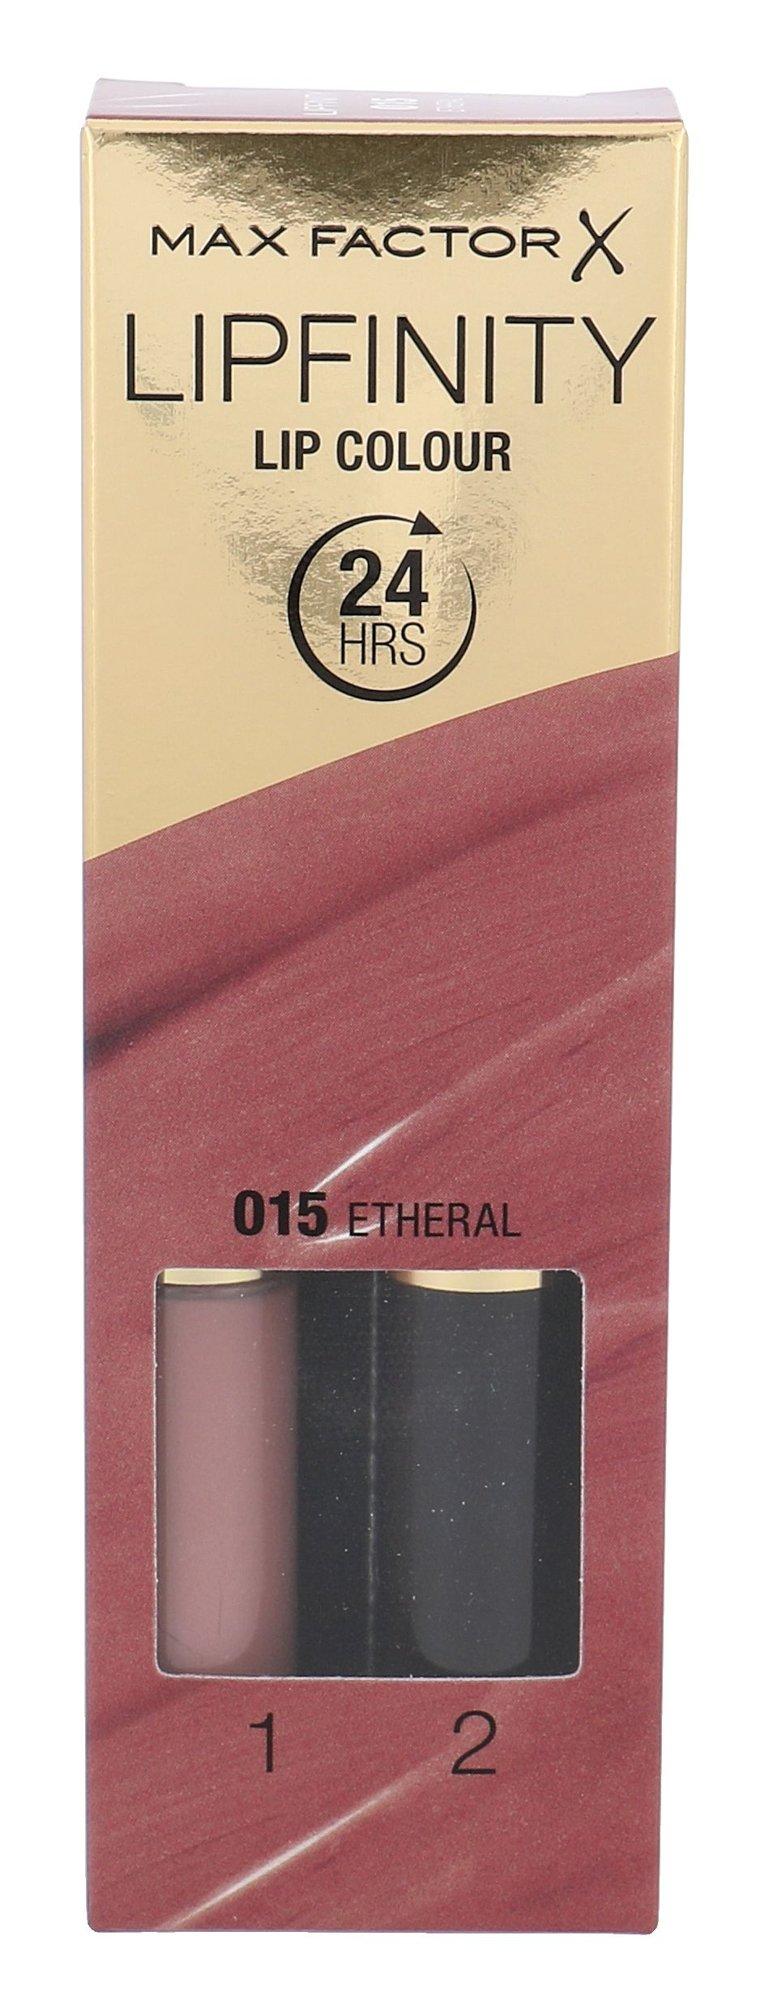 Max Factor Lipfinity Cosmetic 4,2ml 015 Etheral